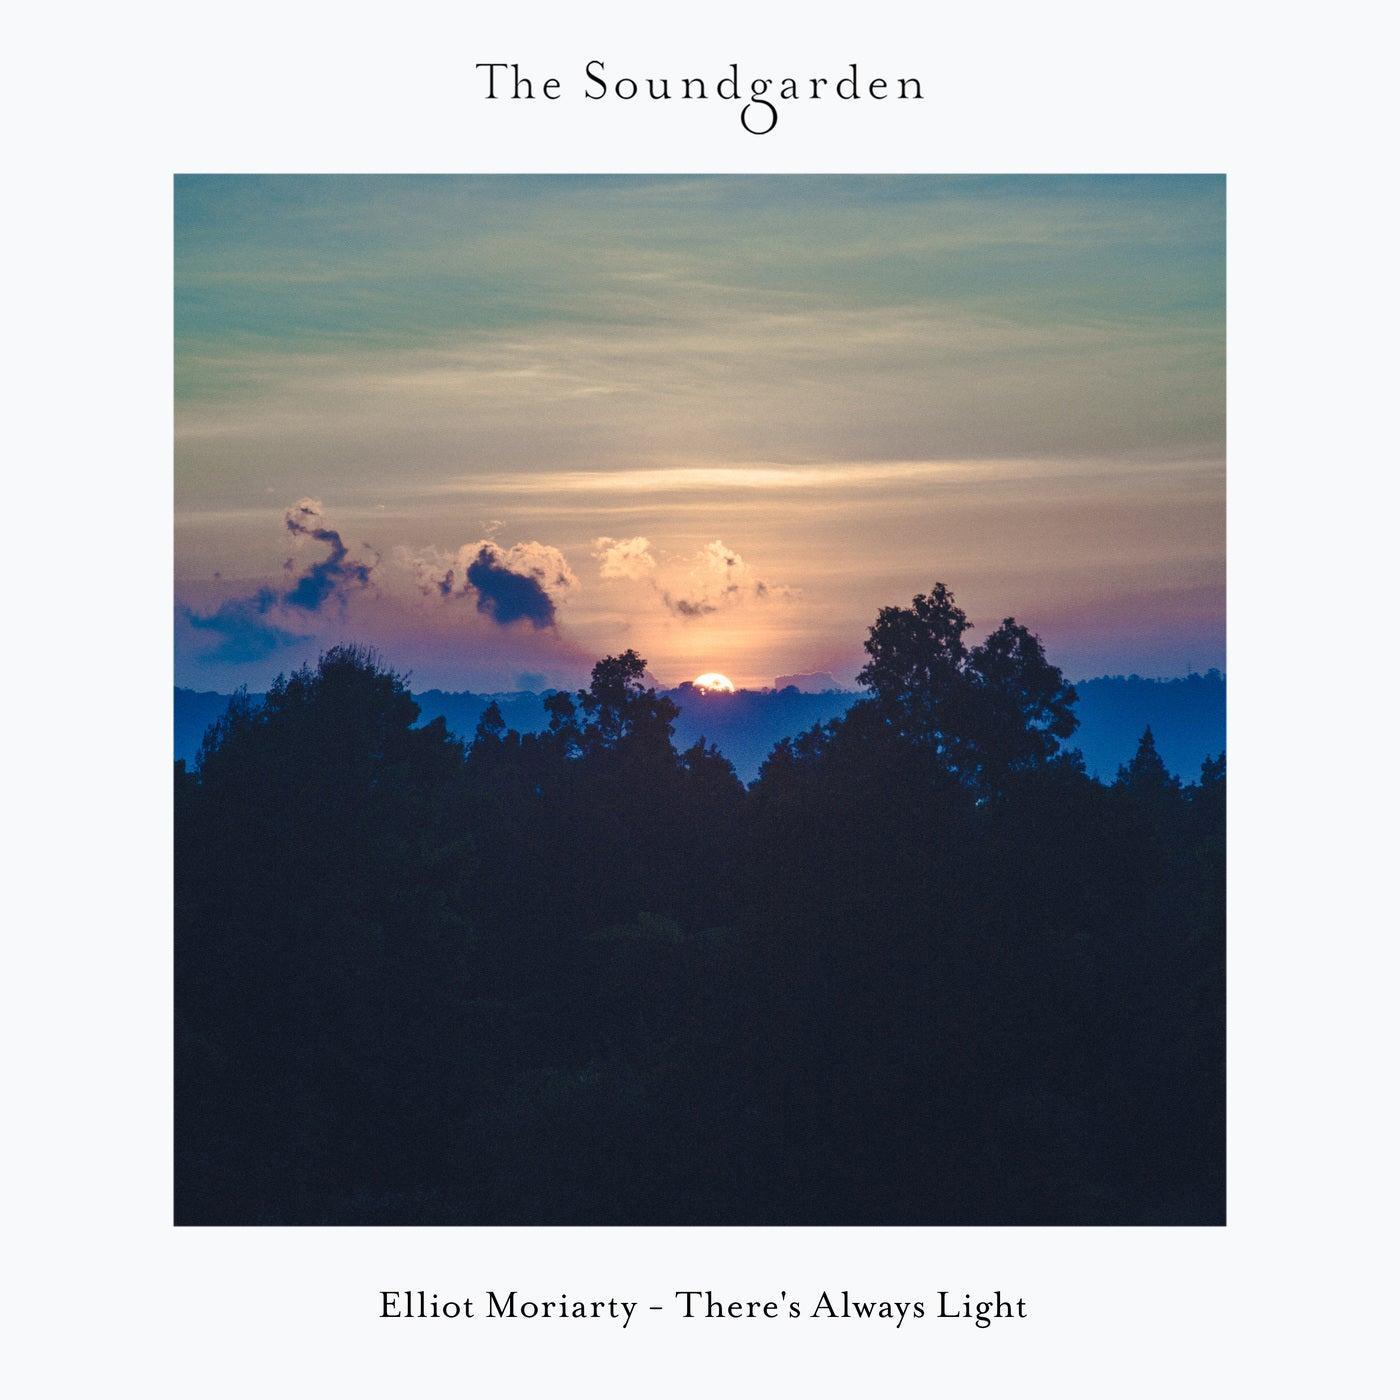 There's Always Light (Original Mix)